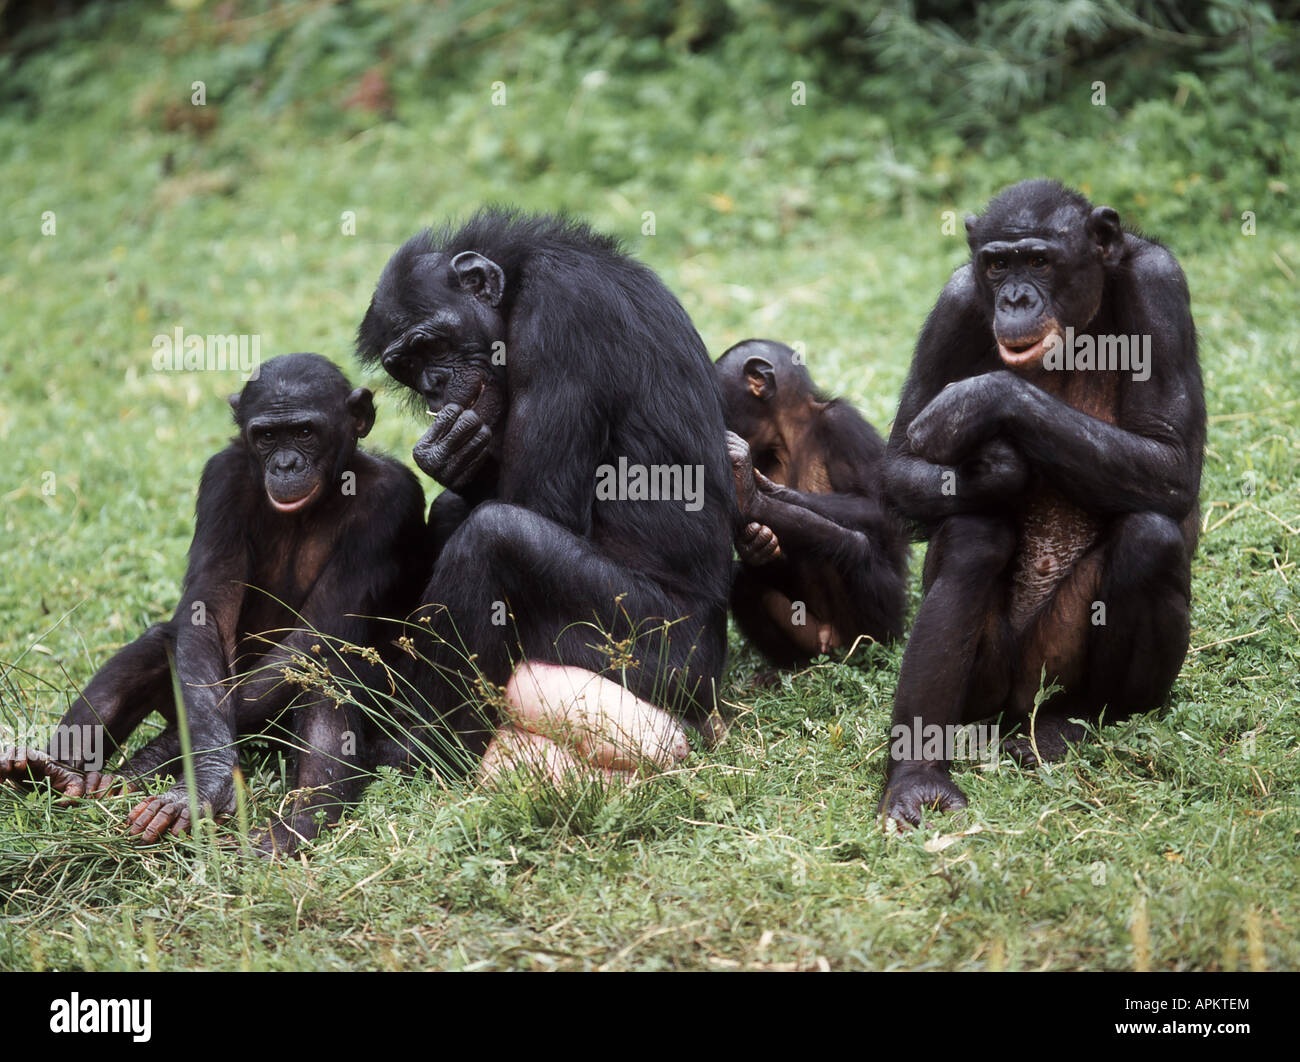 Humans Not Guilty In Shaping Chimpanzee, Bonobo Behavior